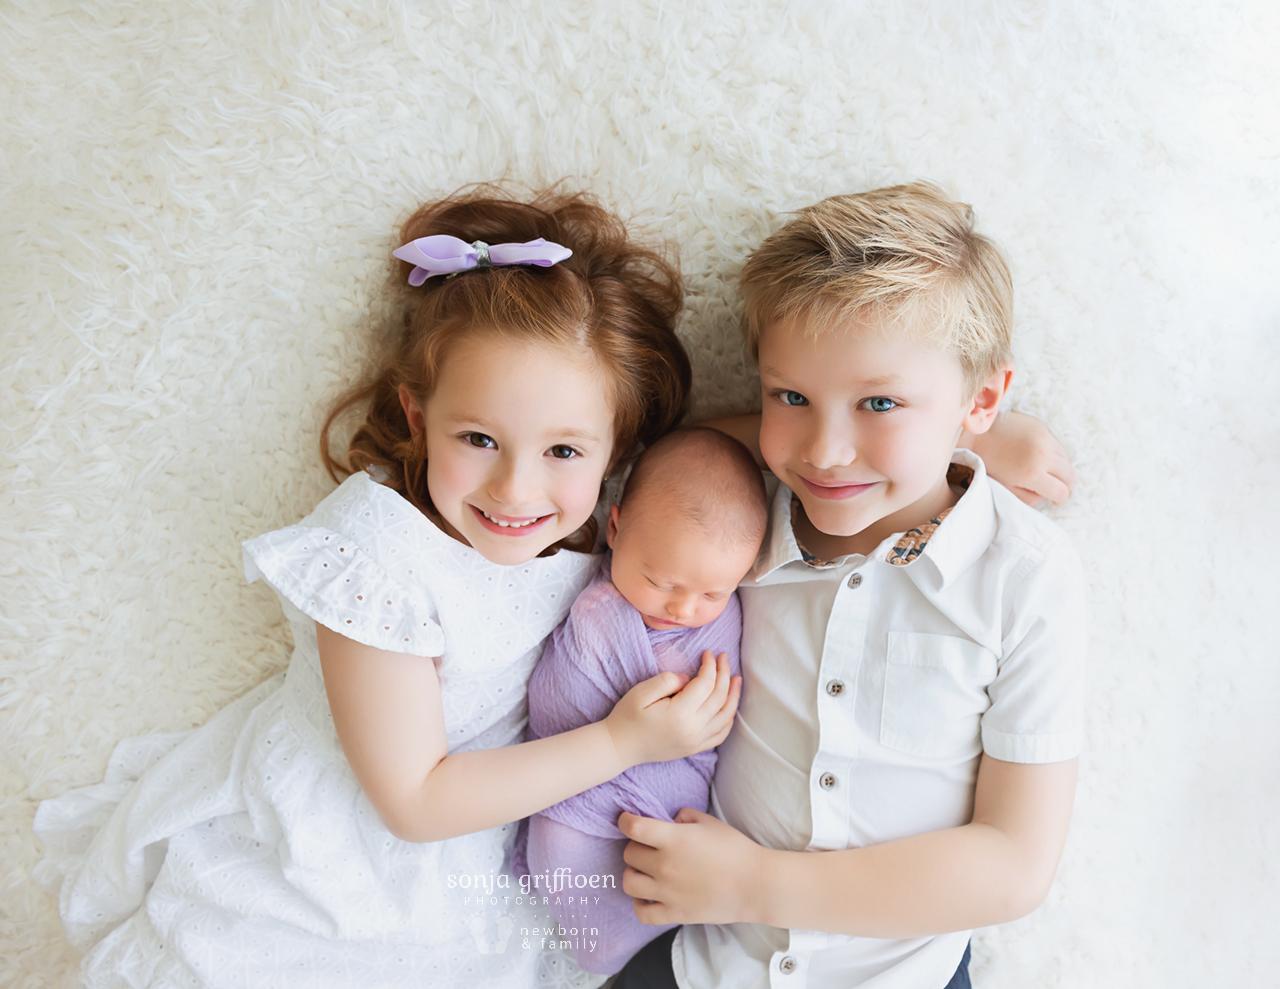 Macey-Newborn-Brisbane-Newborn-Photographer-Sonja-Griffioen-01.jpg